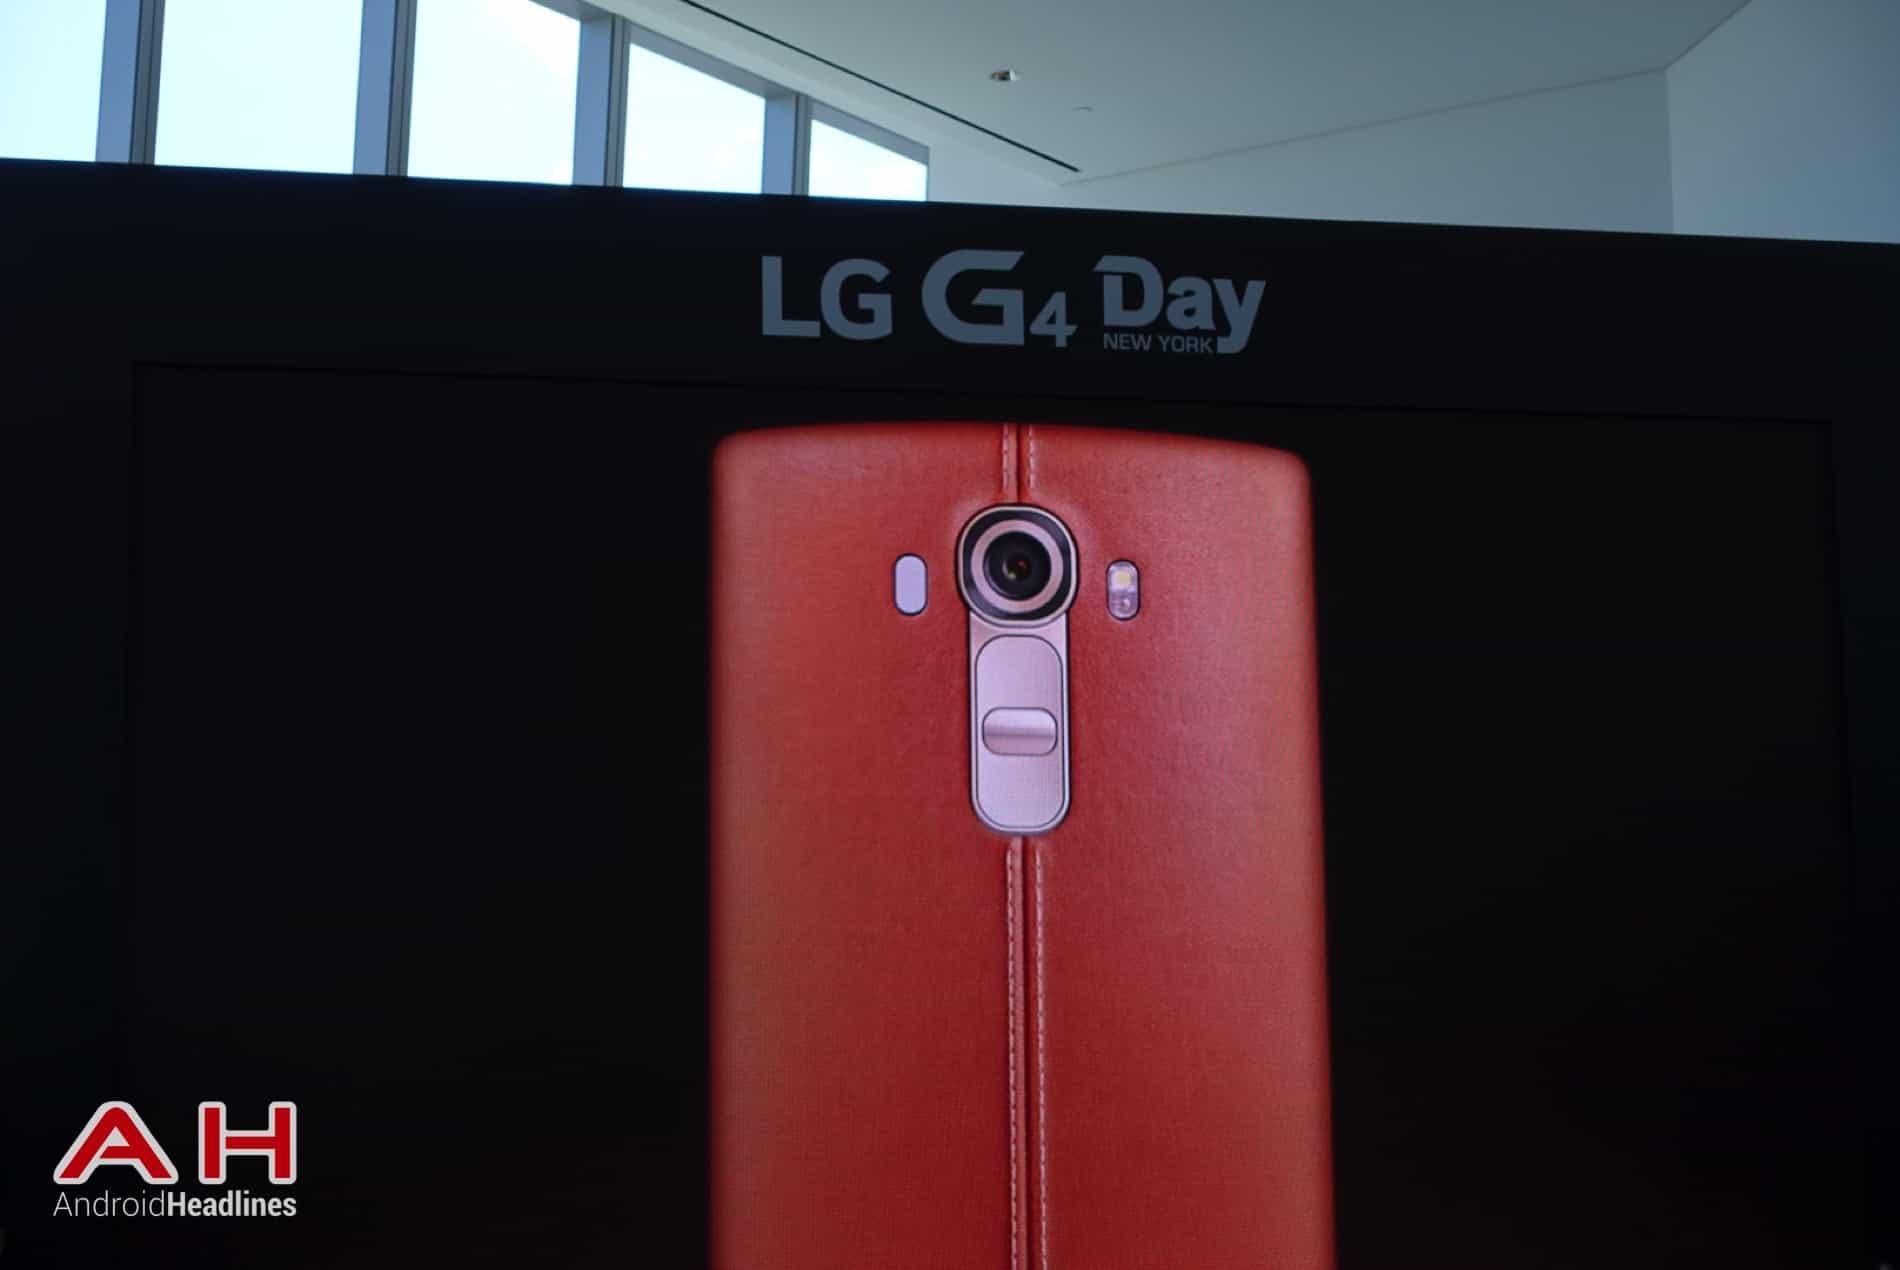 LG G4 Day AH 02 11